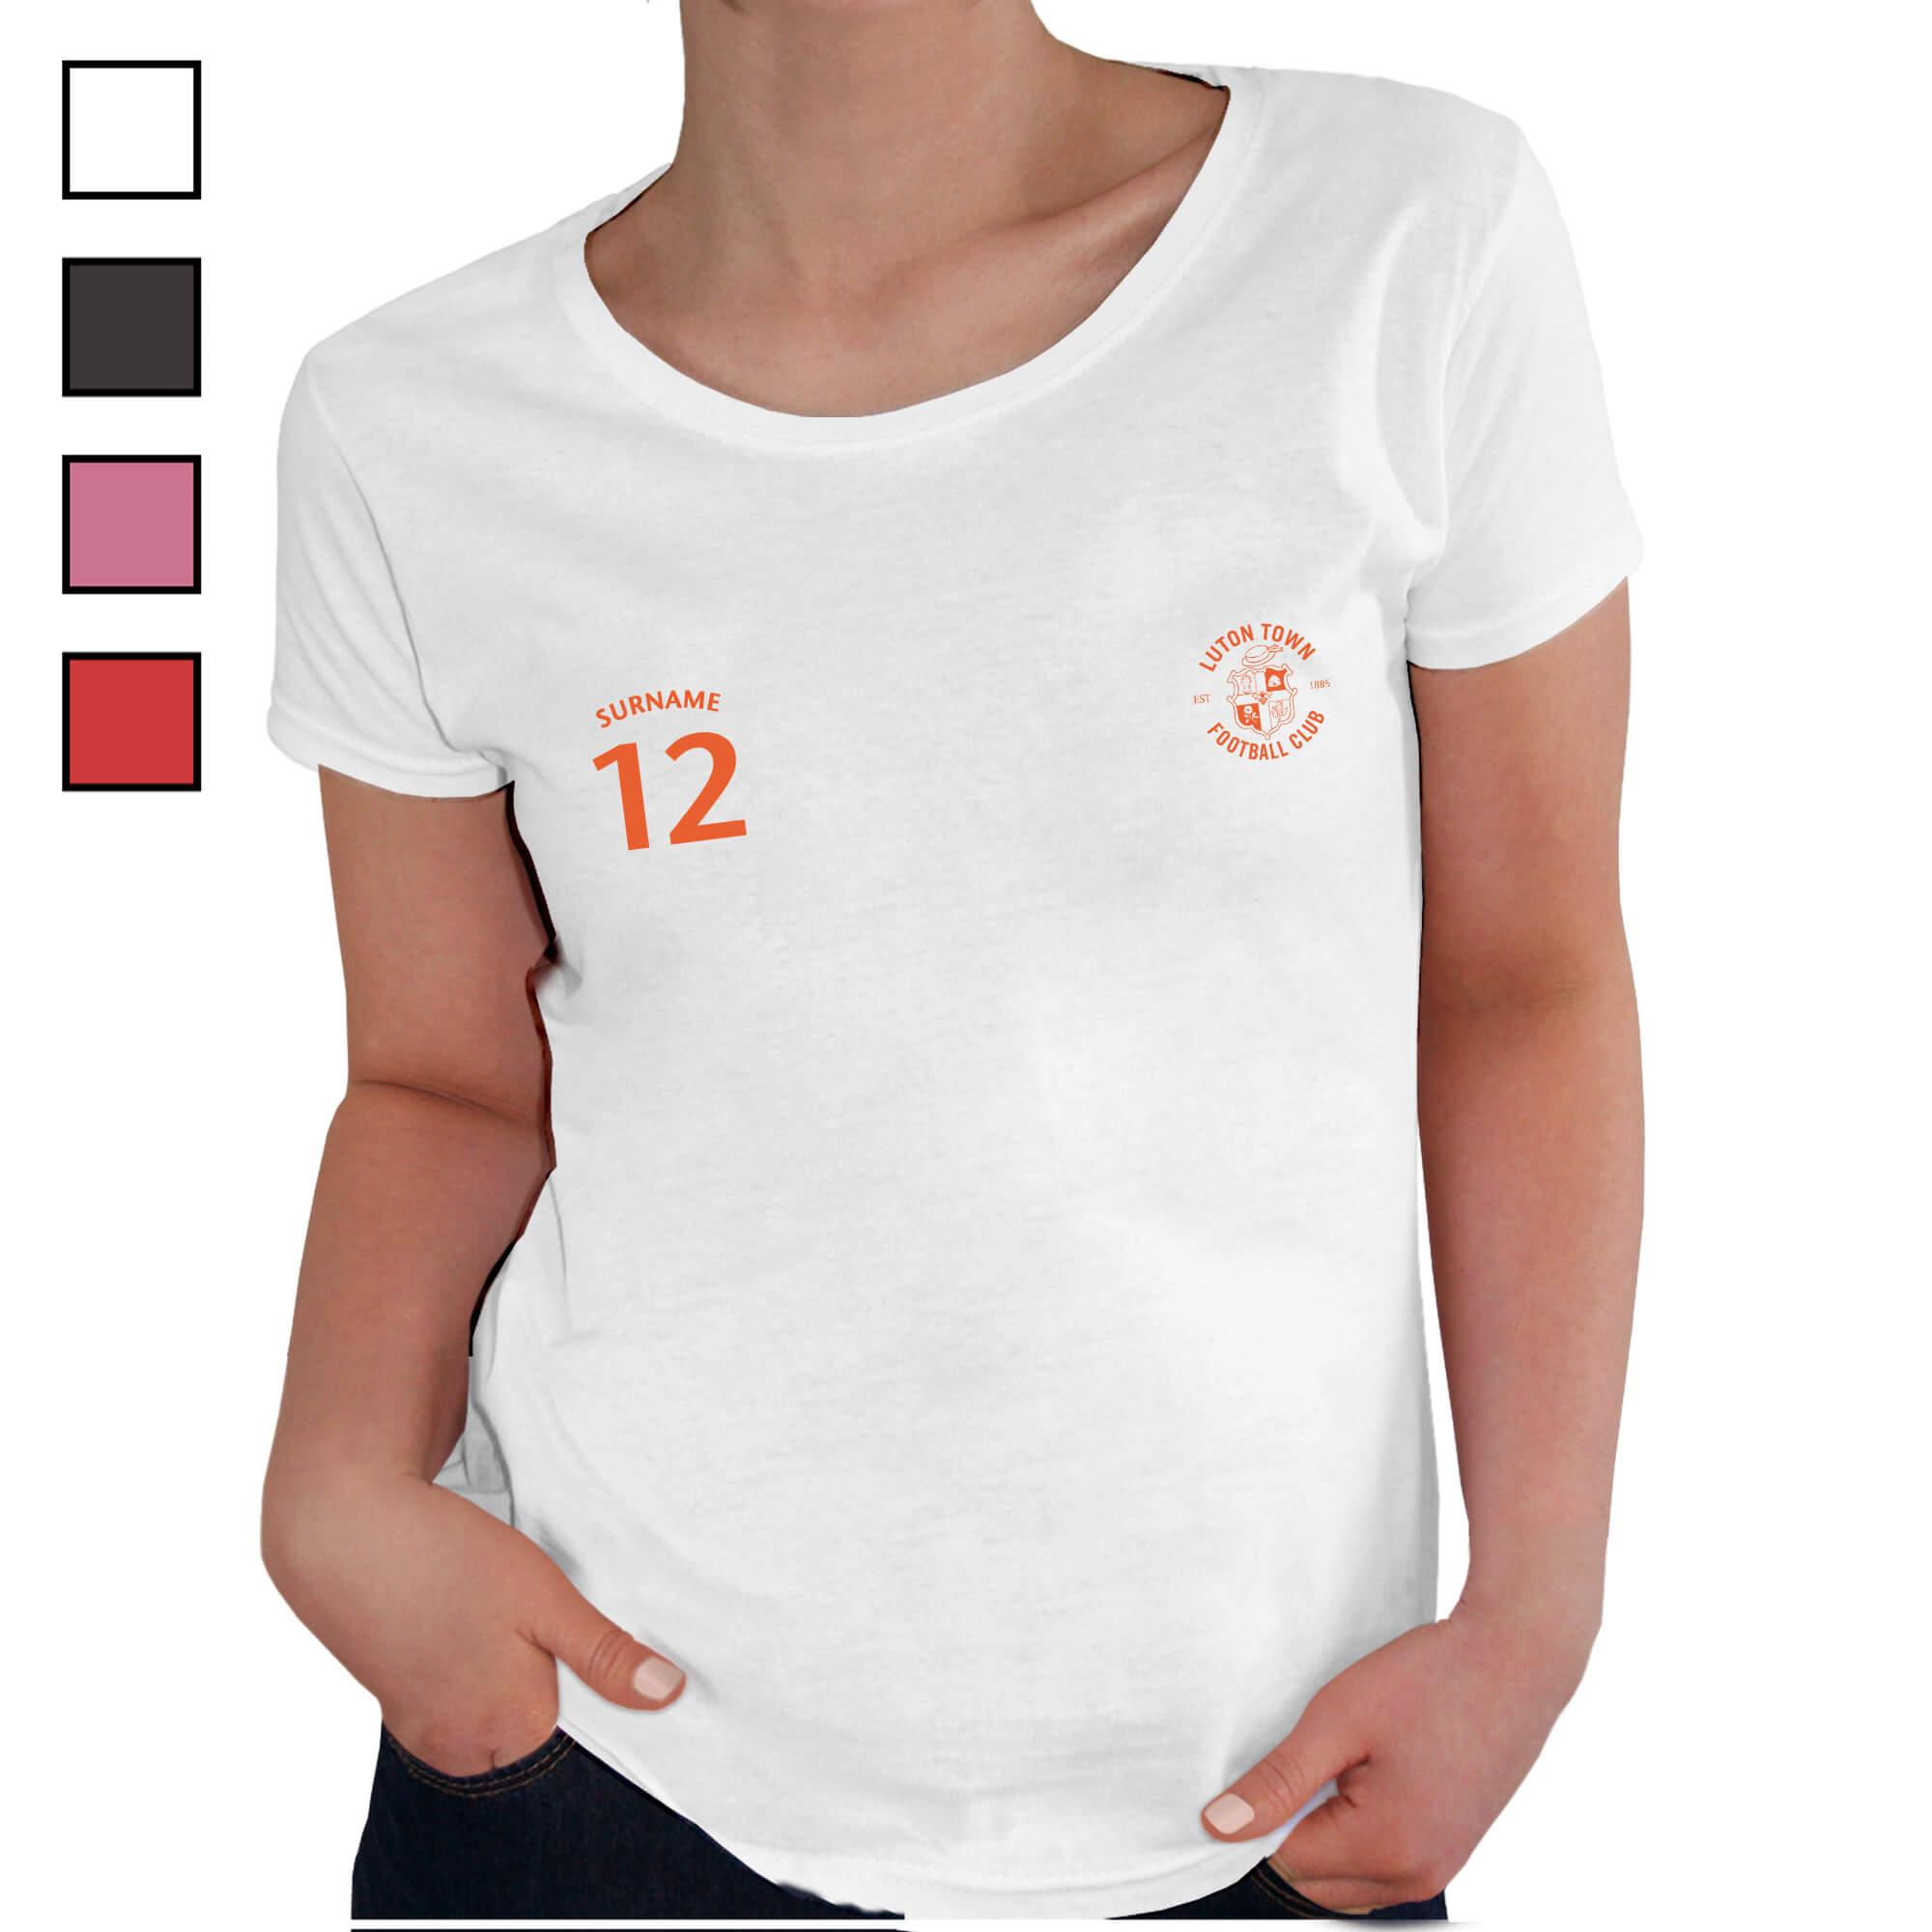 Luton Town FC Ladies Sports T-Shirt